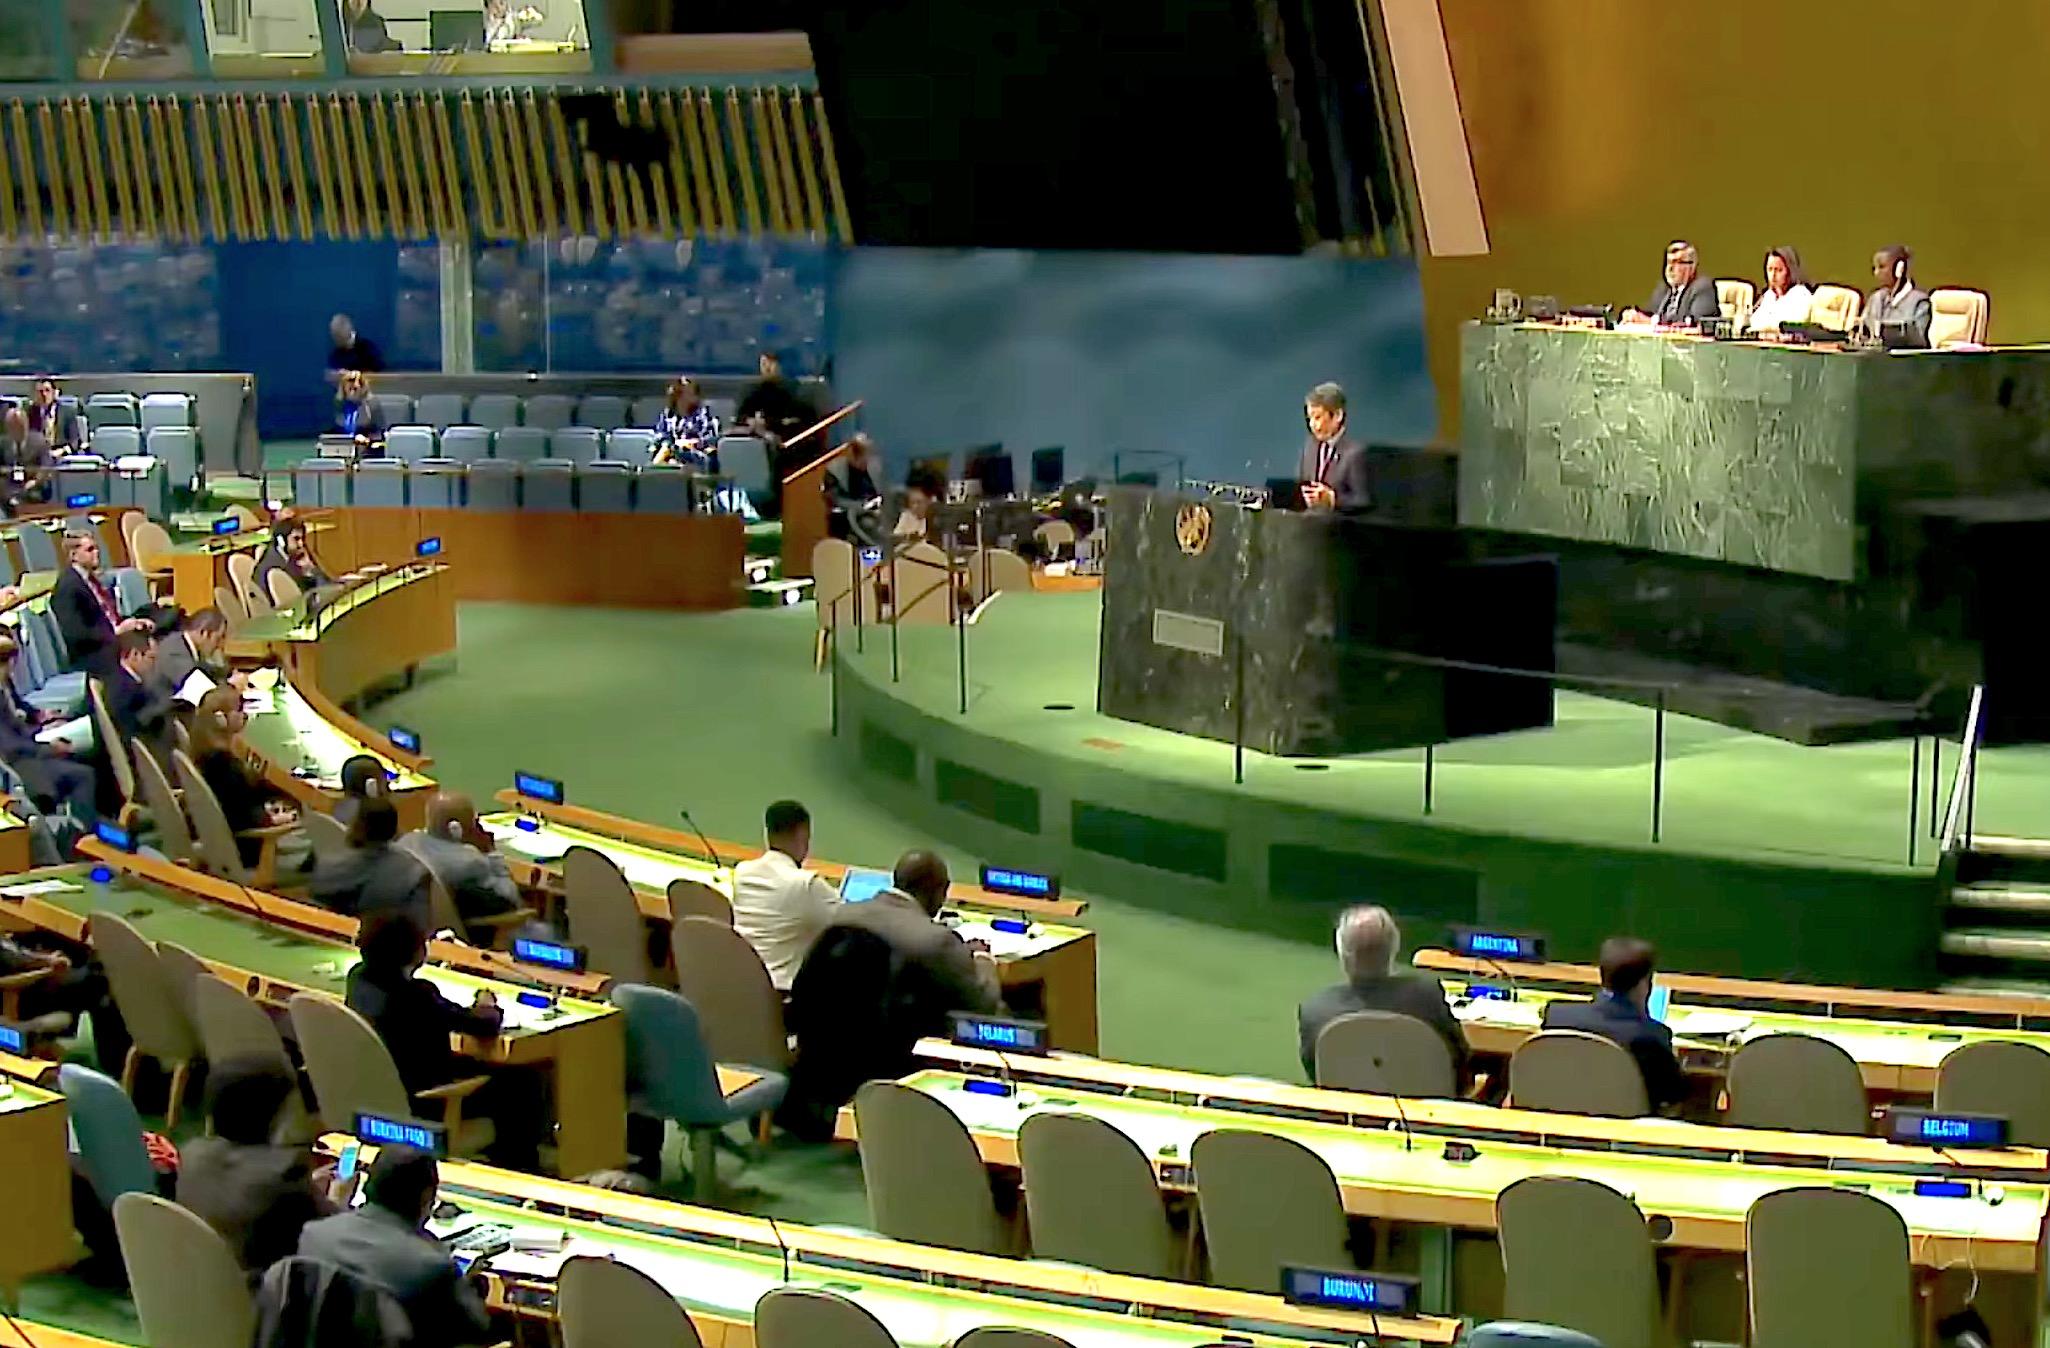 Conferencia ONU sobre el desarme nuclear (Fto web ONU)